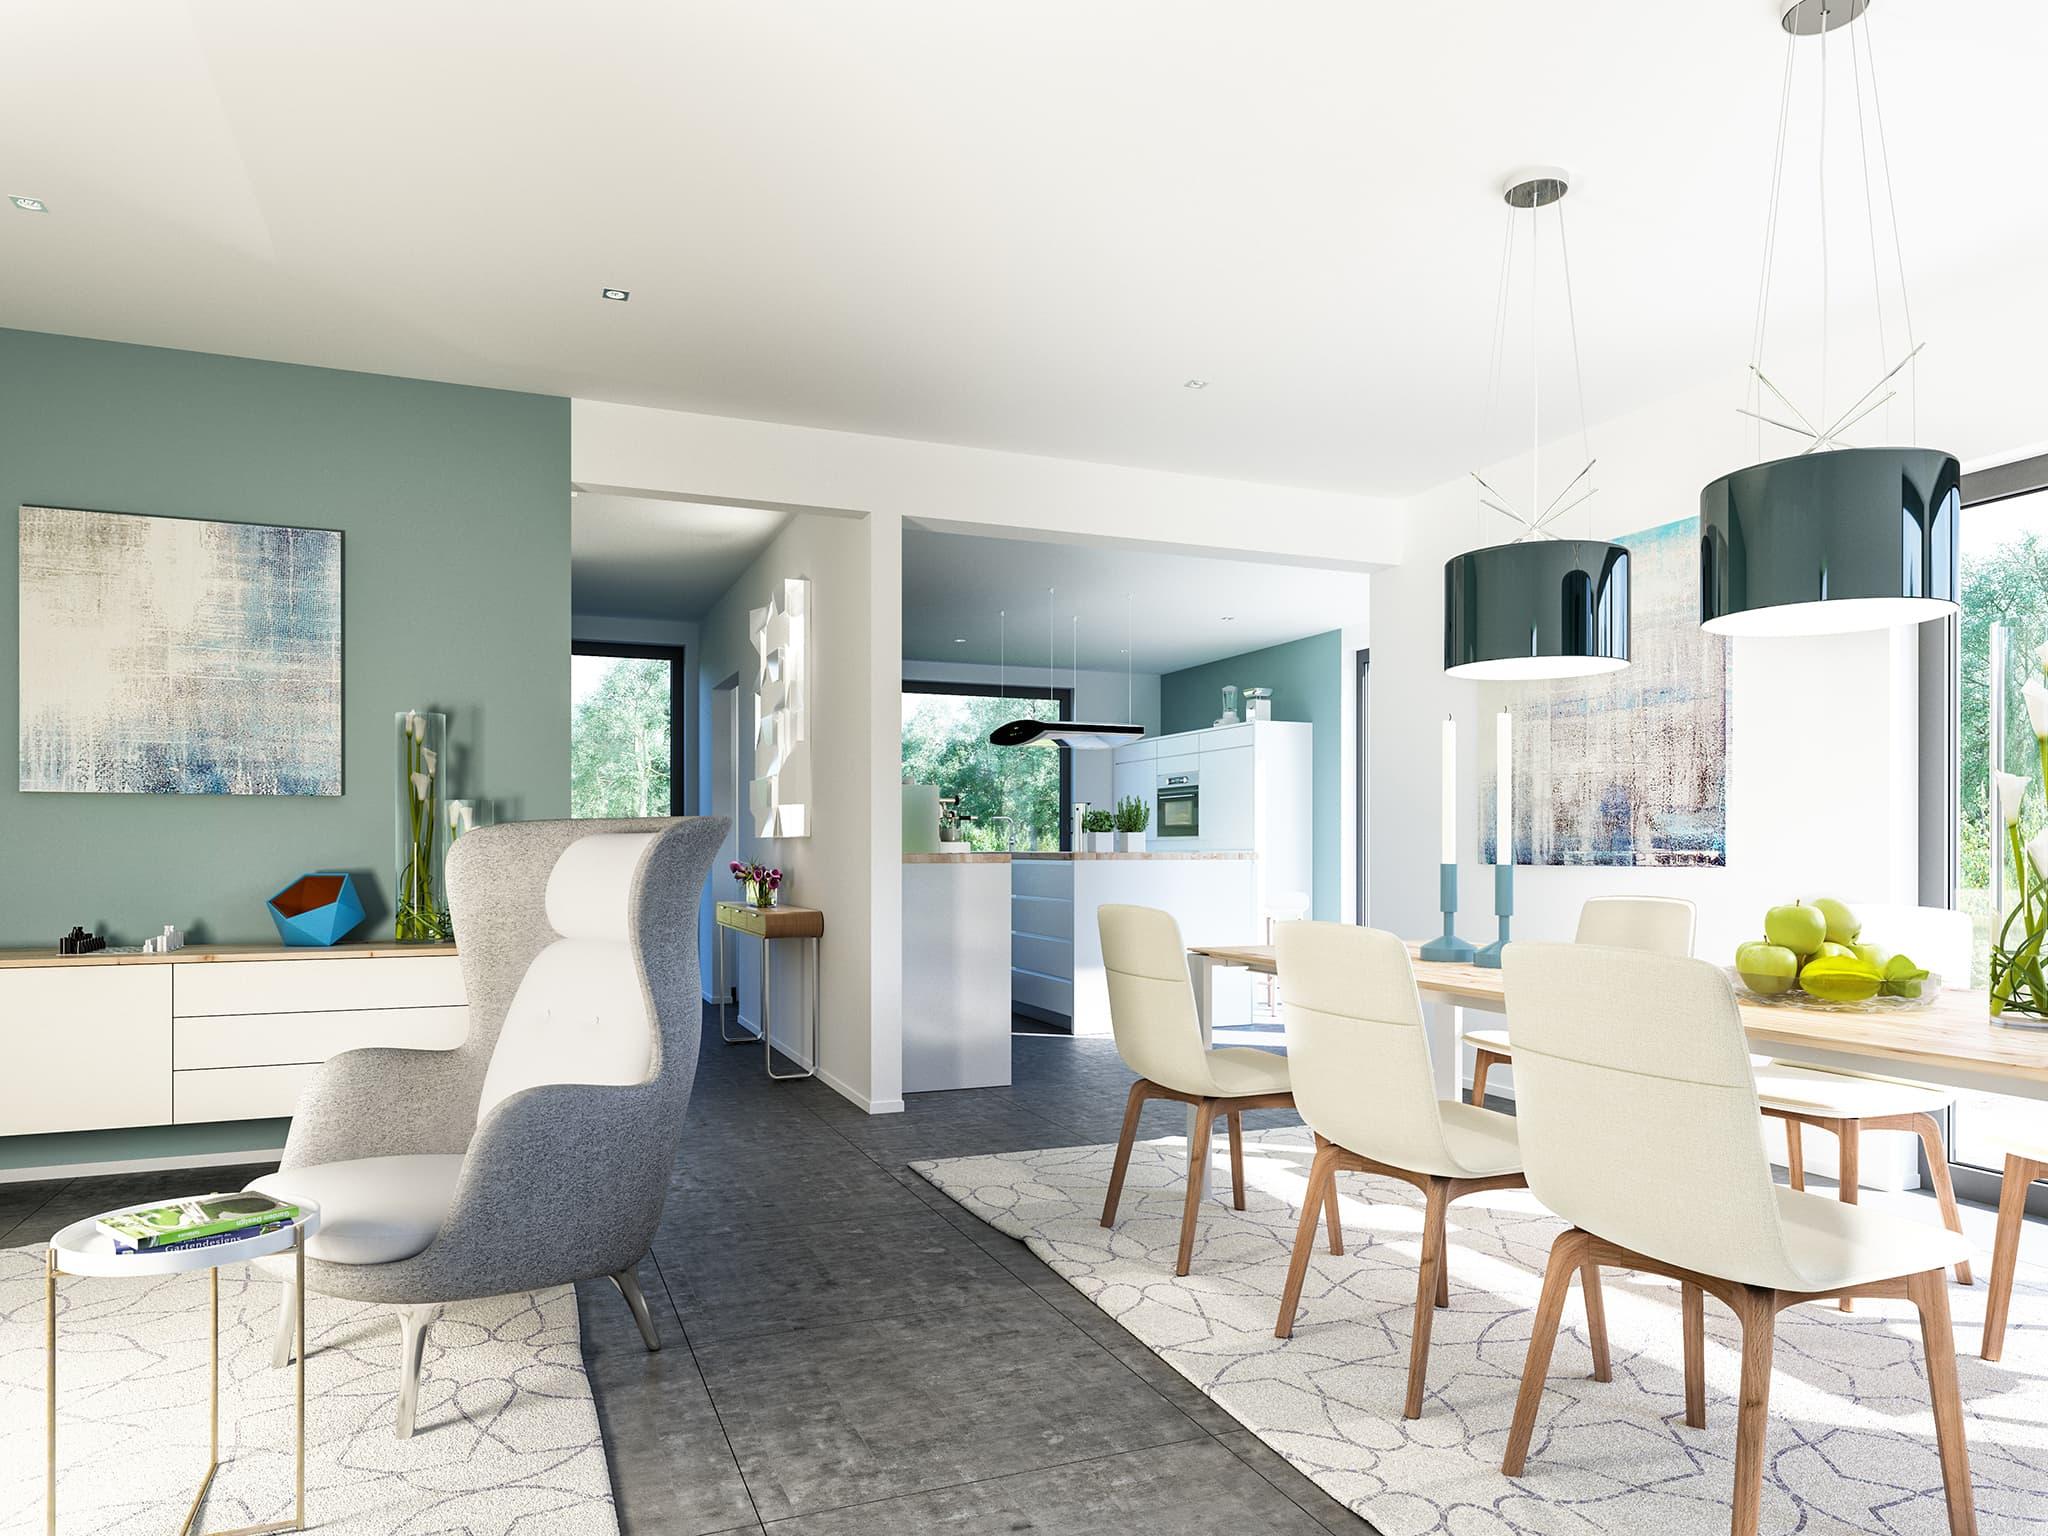 Wohn-Essbereich mit offener Küche - Ideen Stadtvilla Inneneinrichtung Bien Zenker Fertighaus FANTASTIC 163 V8 - HausbauDirekt.de